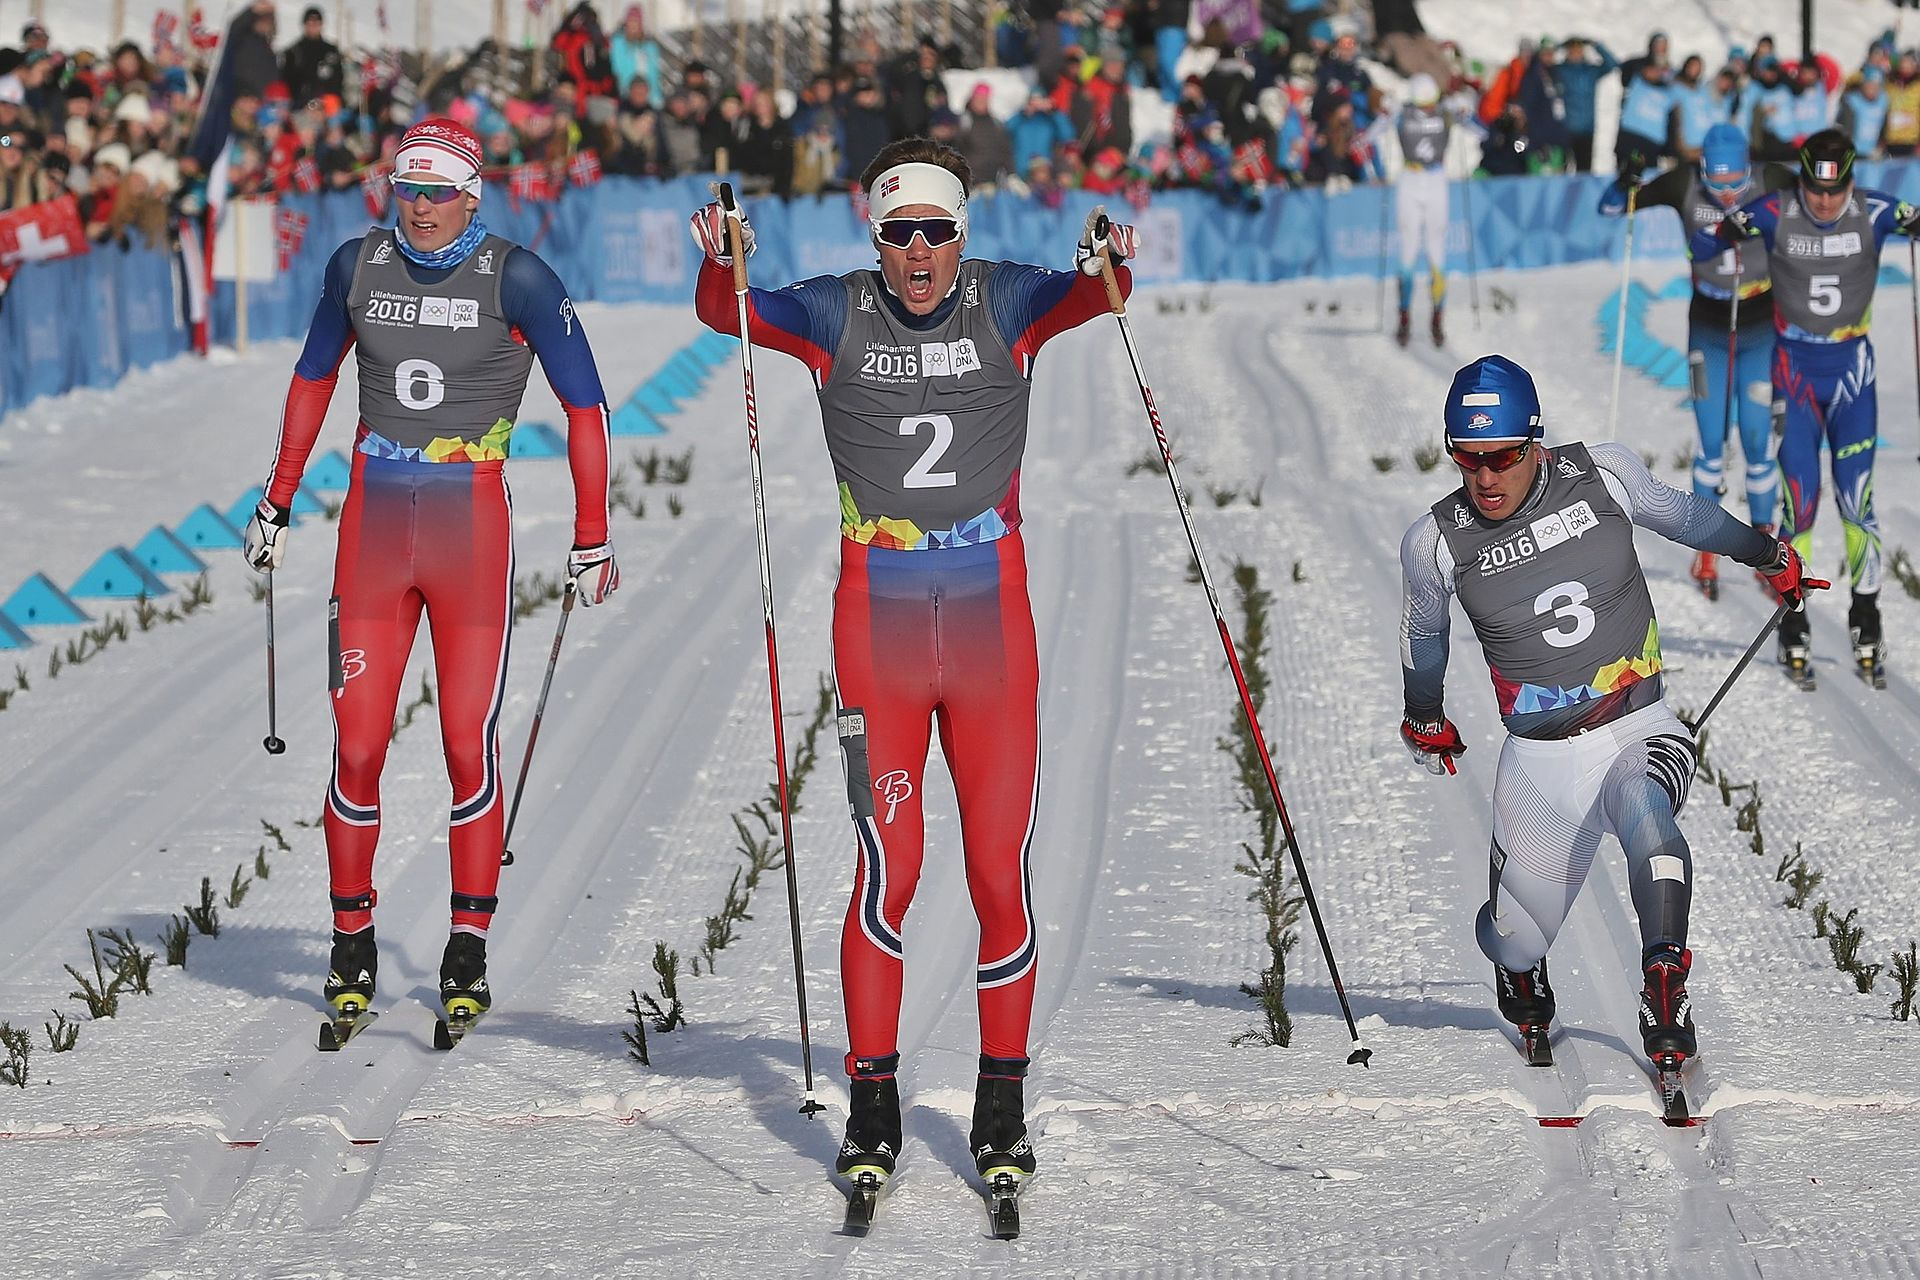 Olympic cross country ski